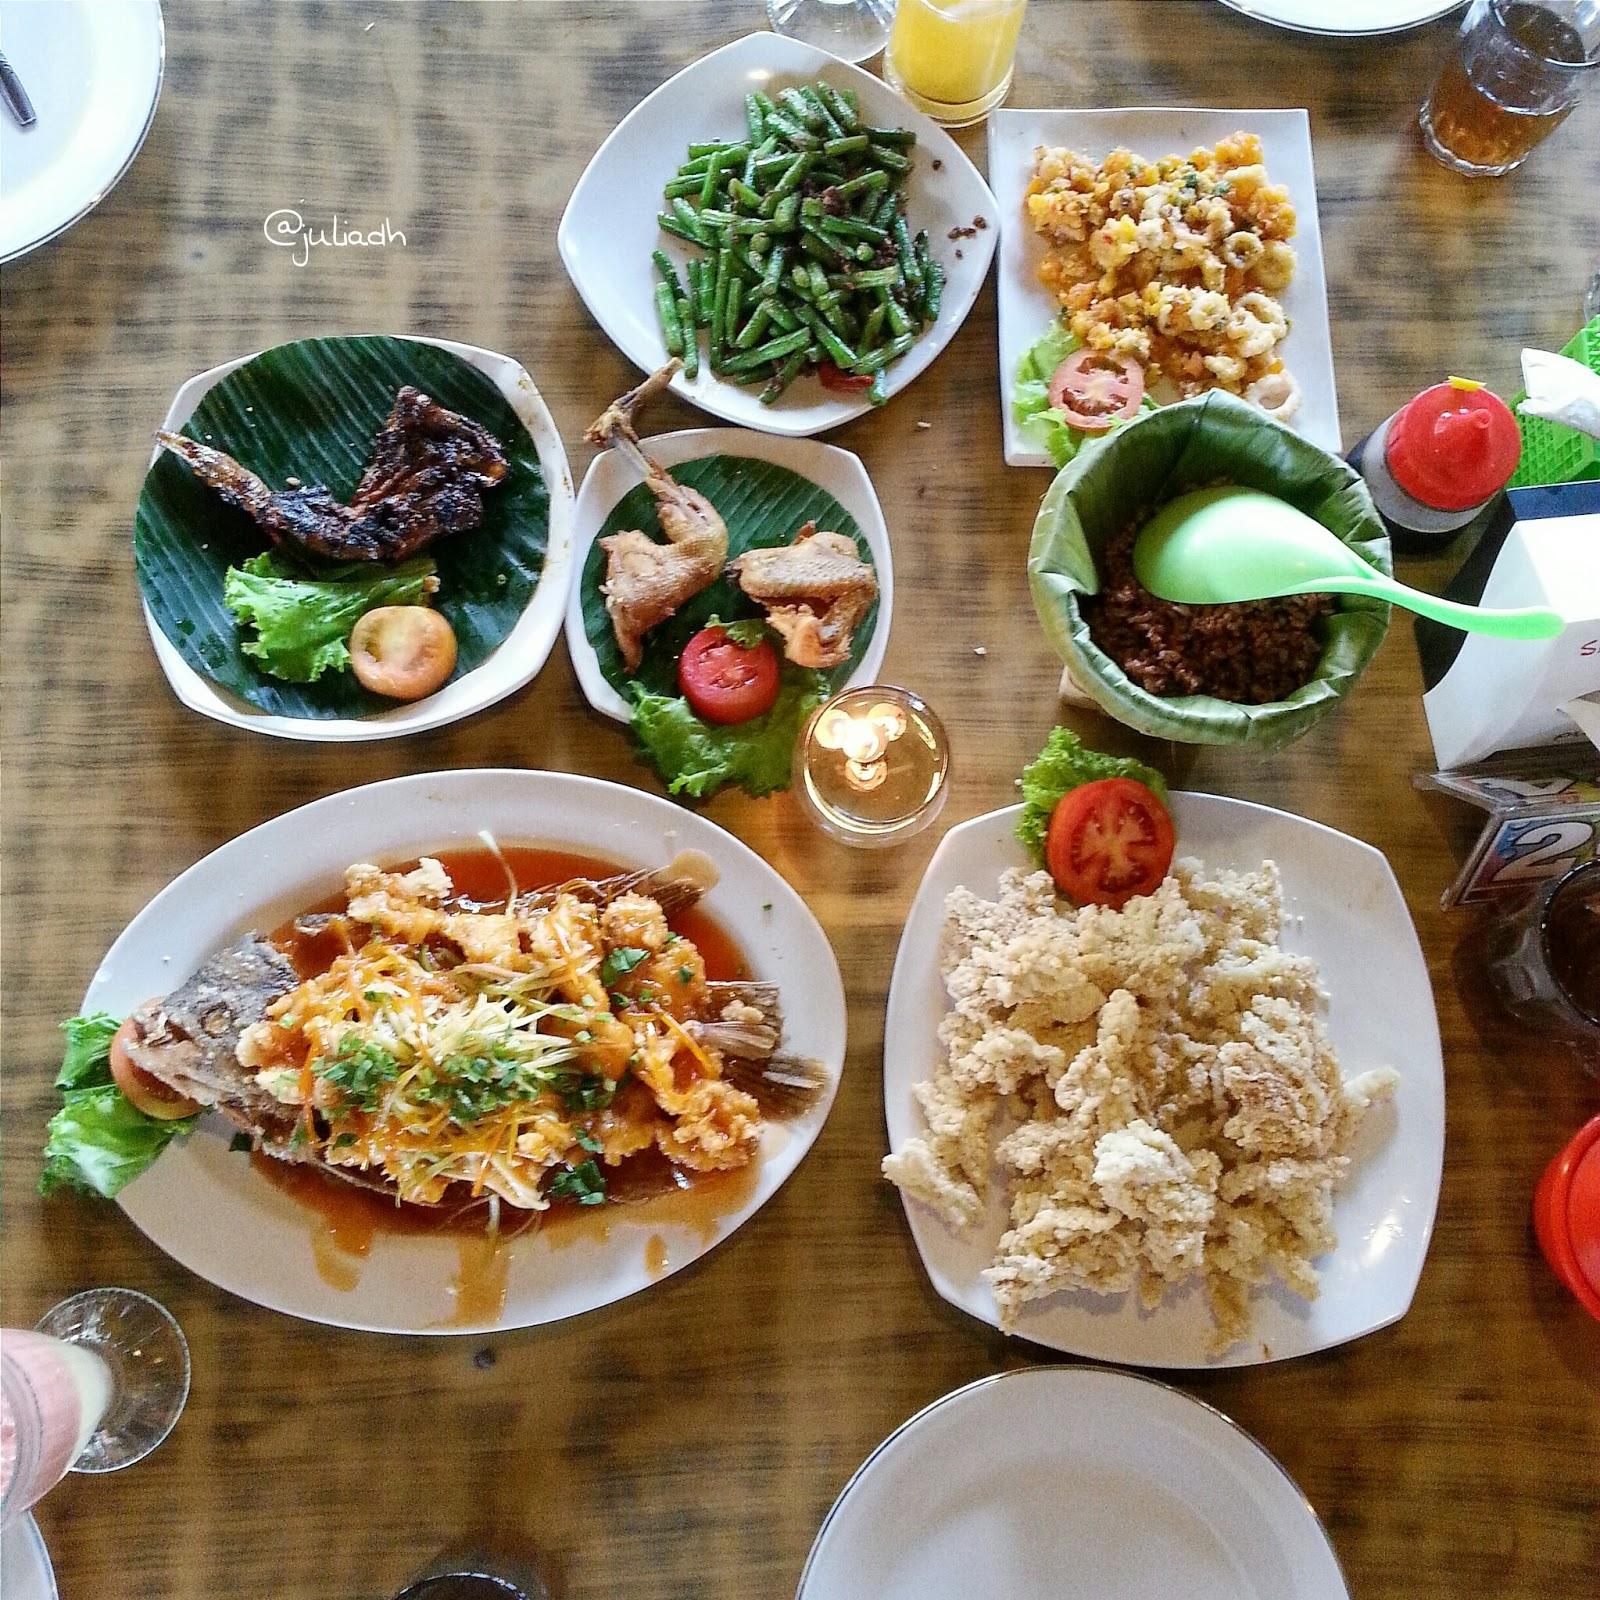 culinary resto keluarga nomor satu di bogor saung kuring jdfoodiary rh jdfoodiary blogspot com